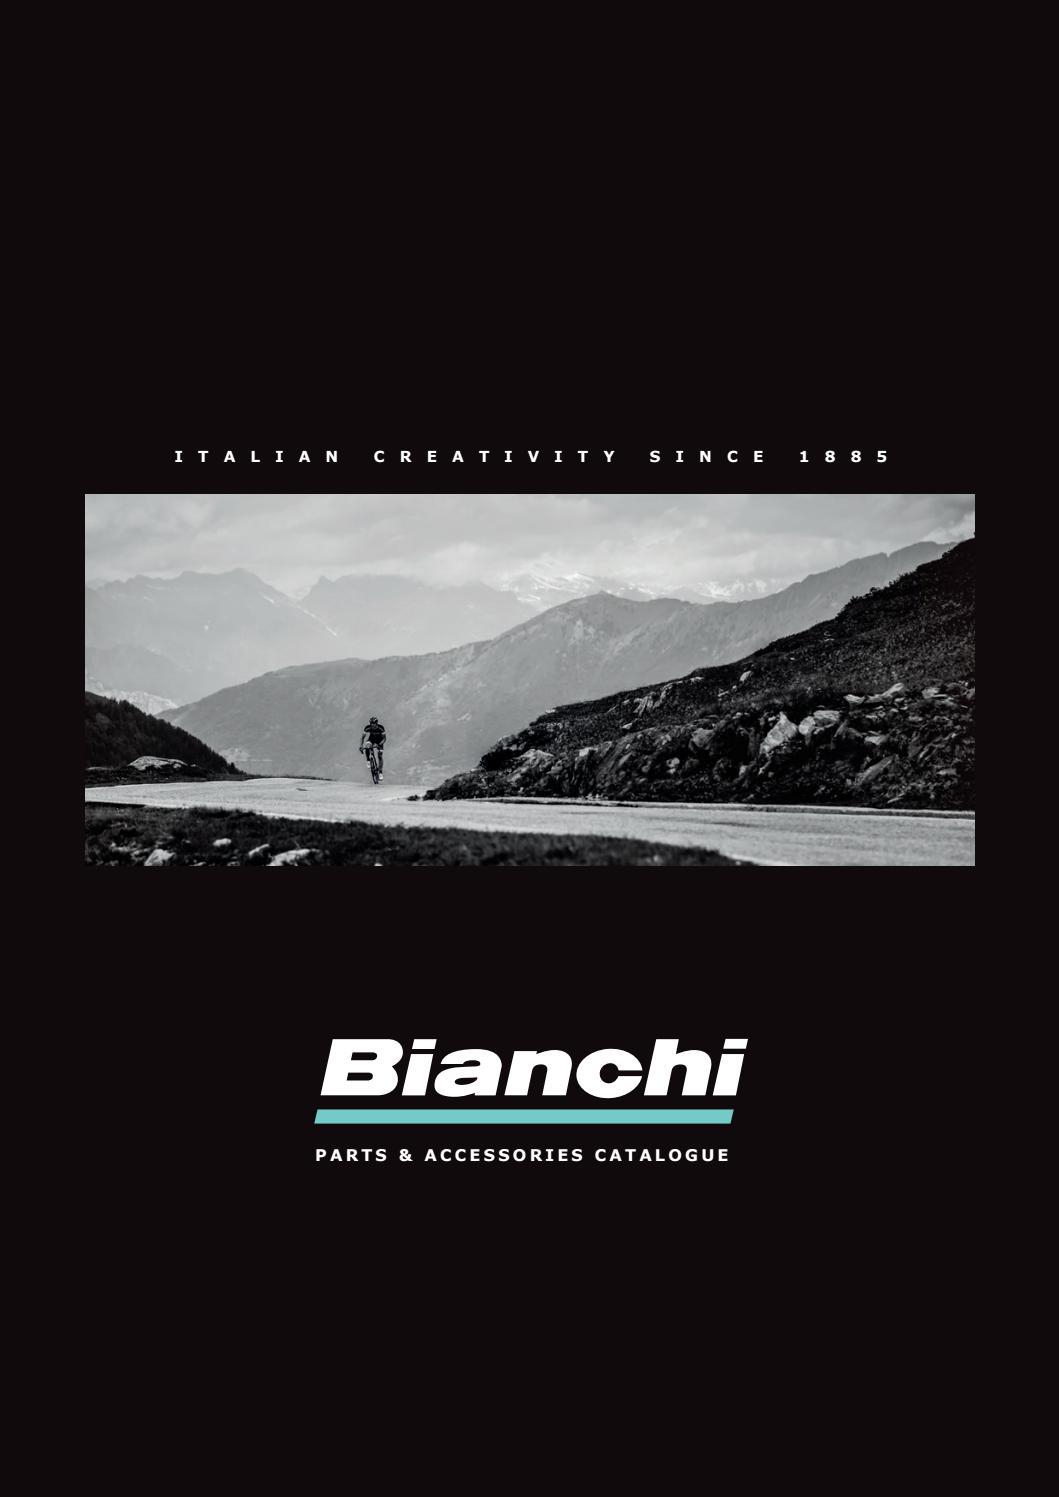 BIANCHI EOLO SOFT MICROTEX HANDLEBAR TAPE Celeste,Black or White